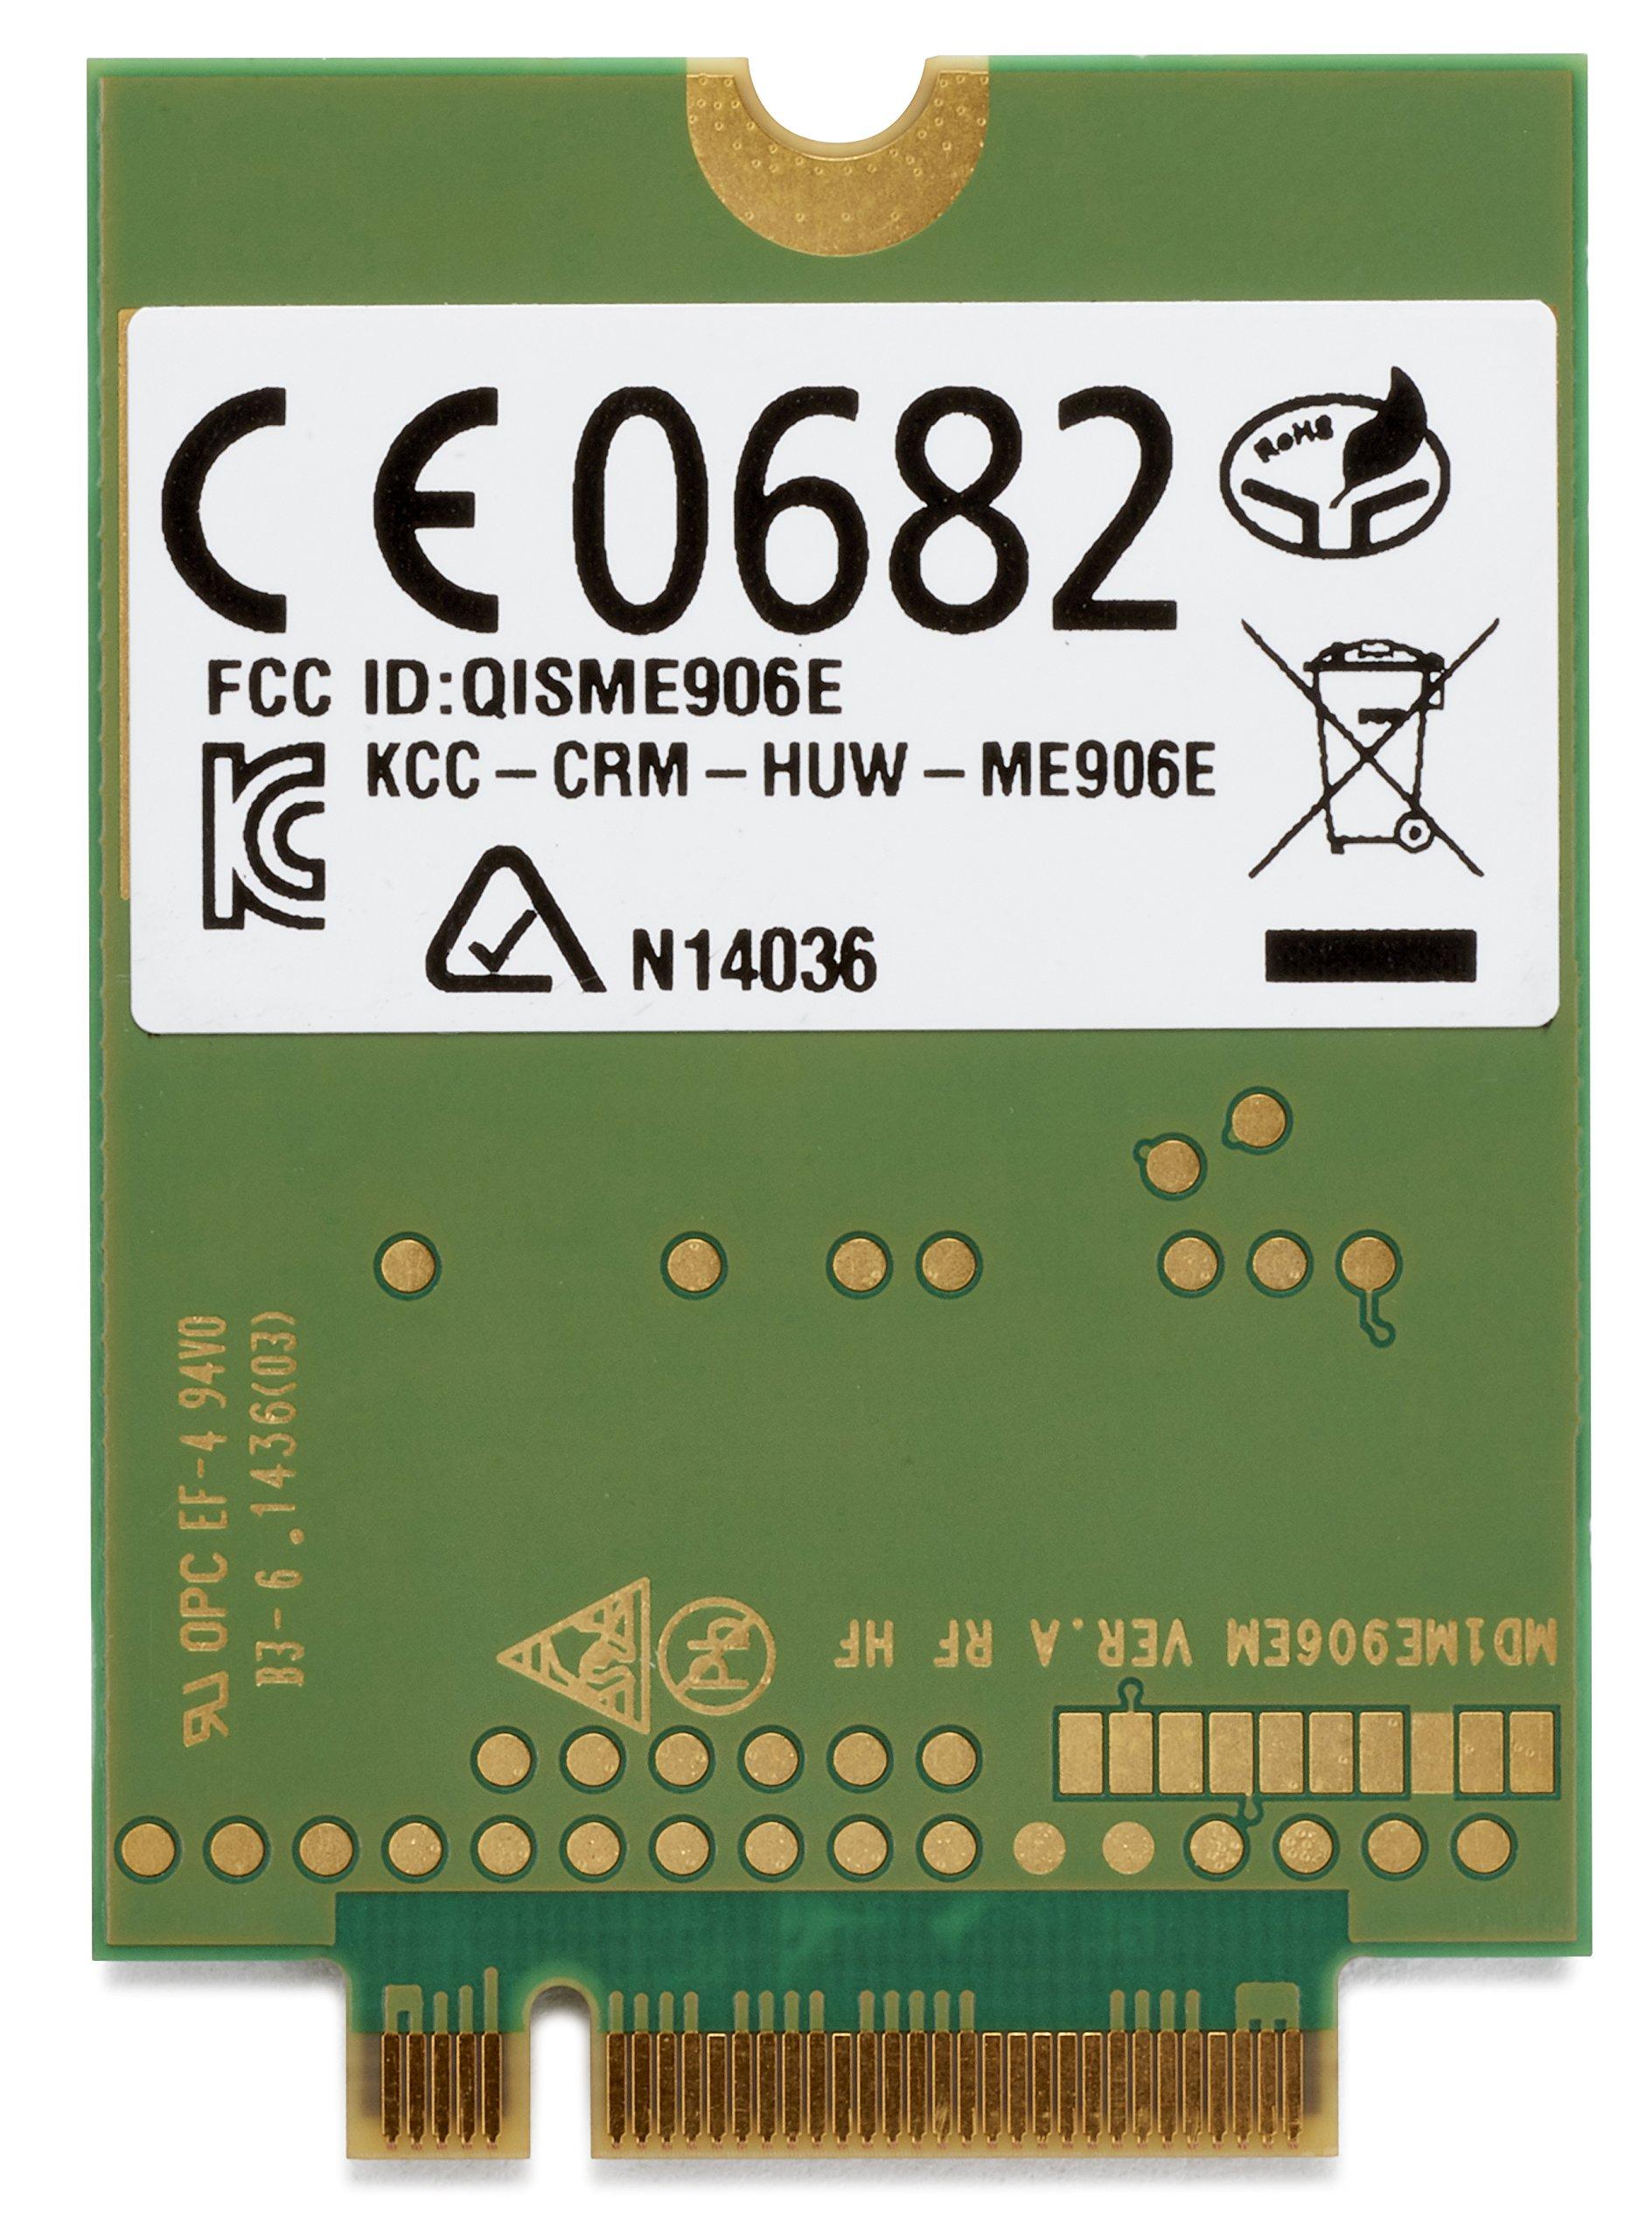 HP SMART BUY LT4211 LTE EV-DO HSPA+ WWAN J8F06UT